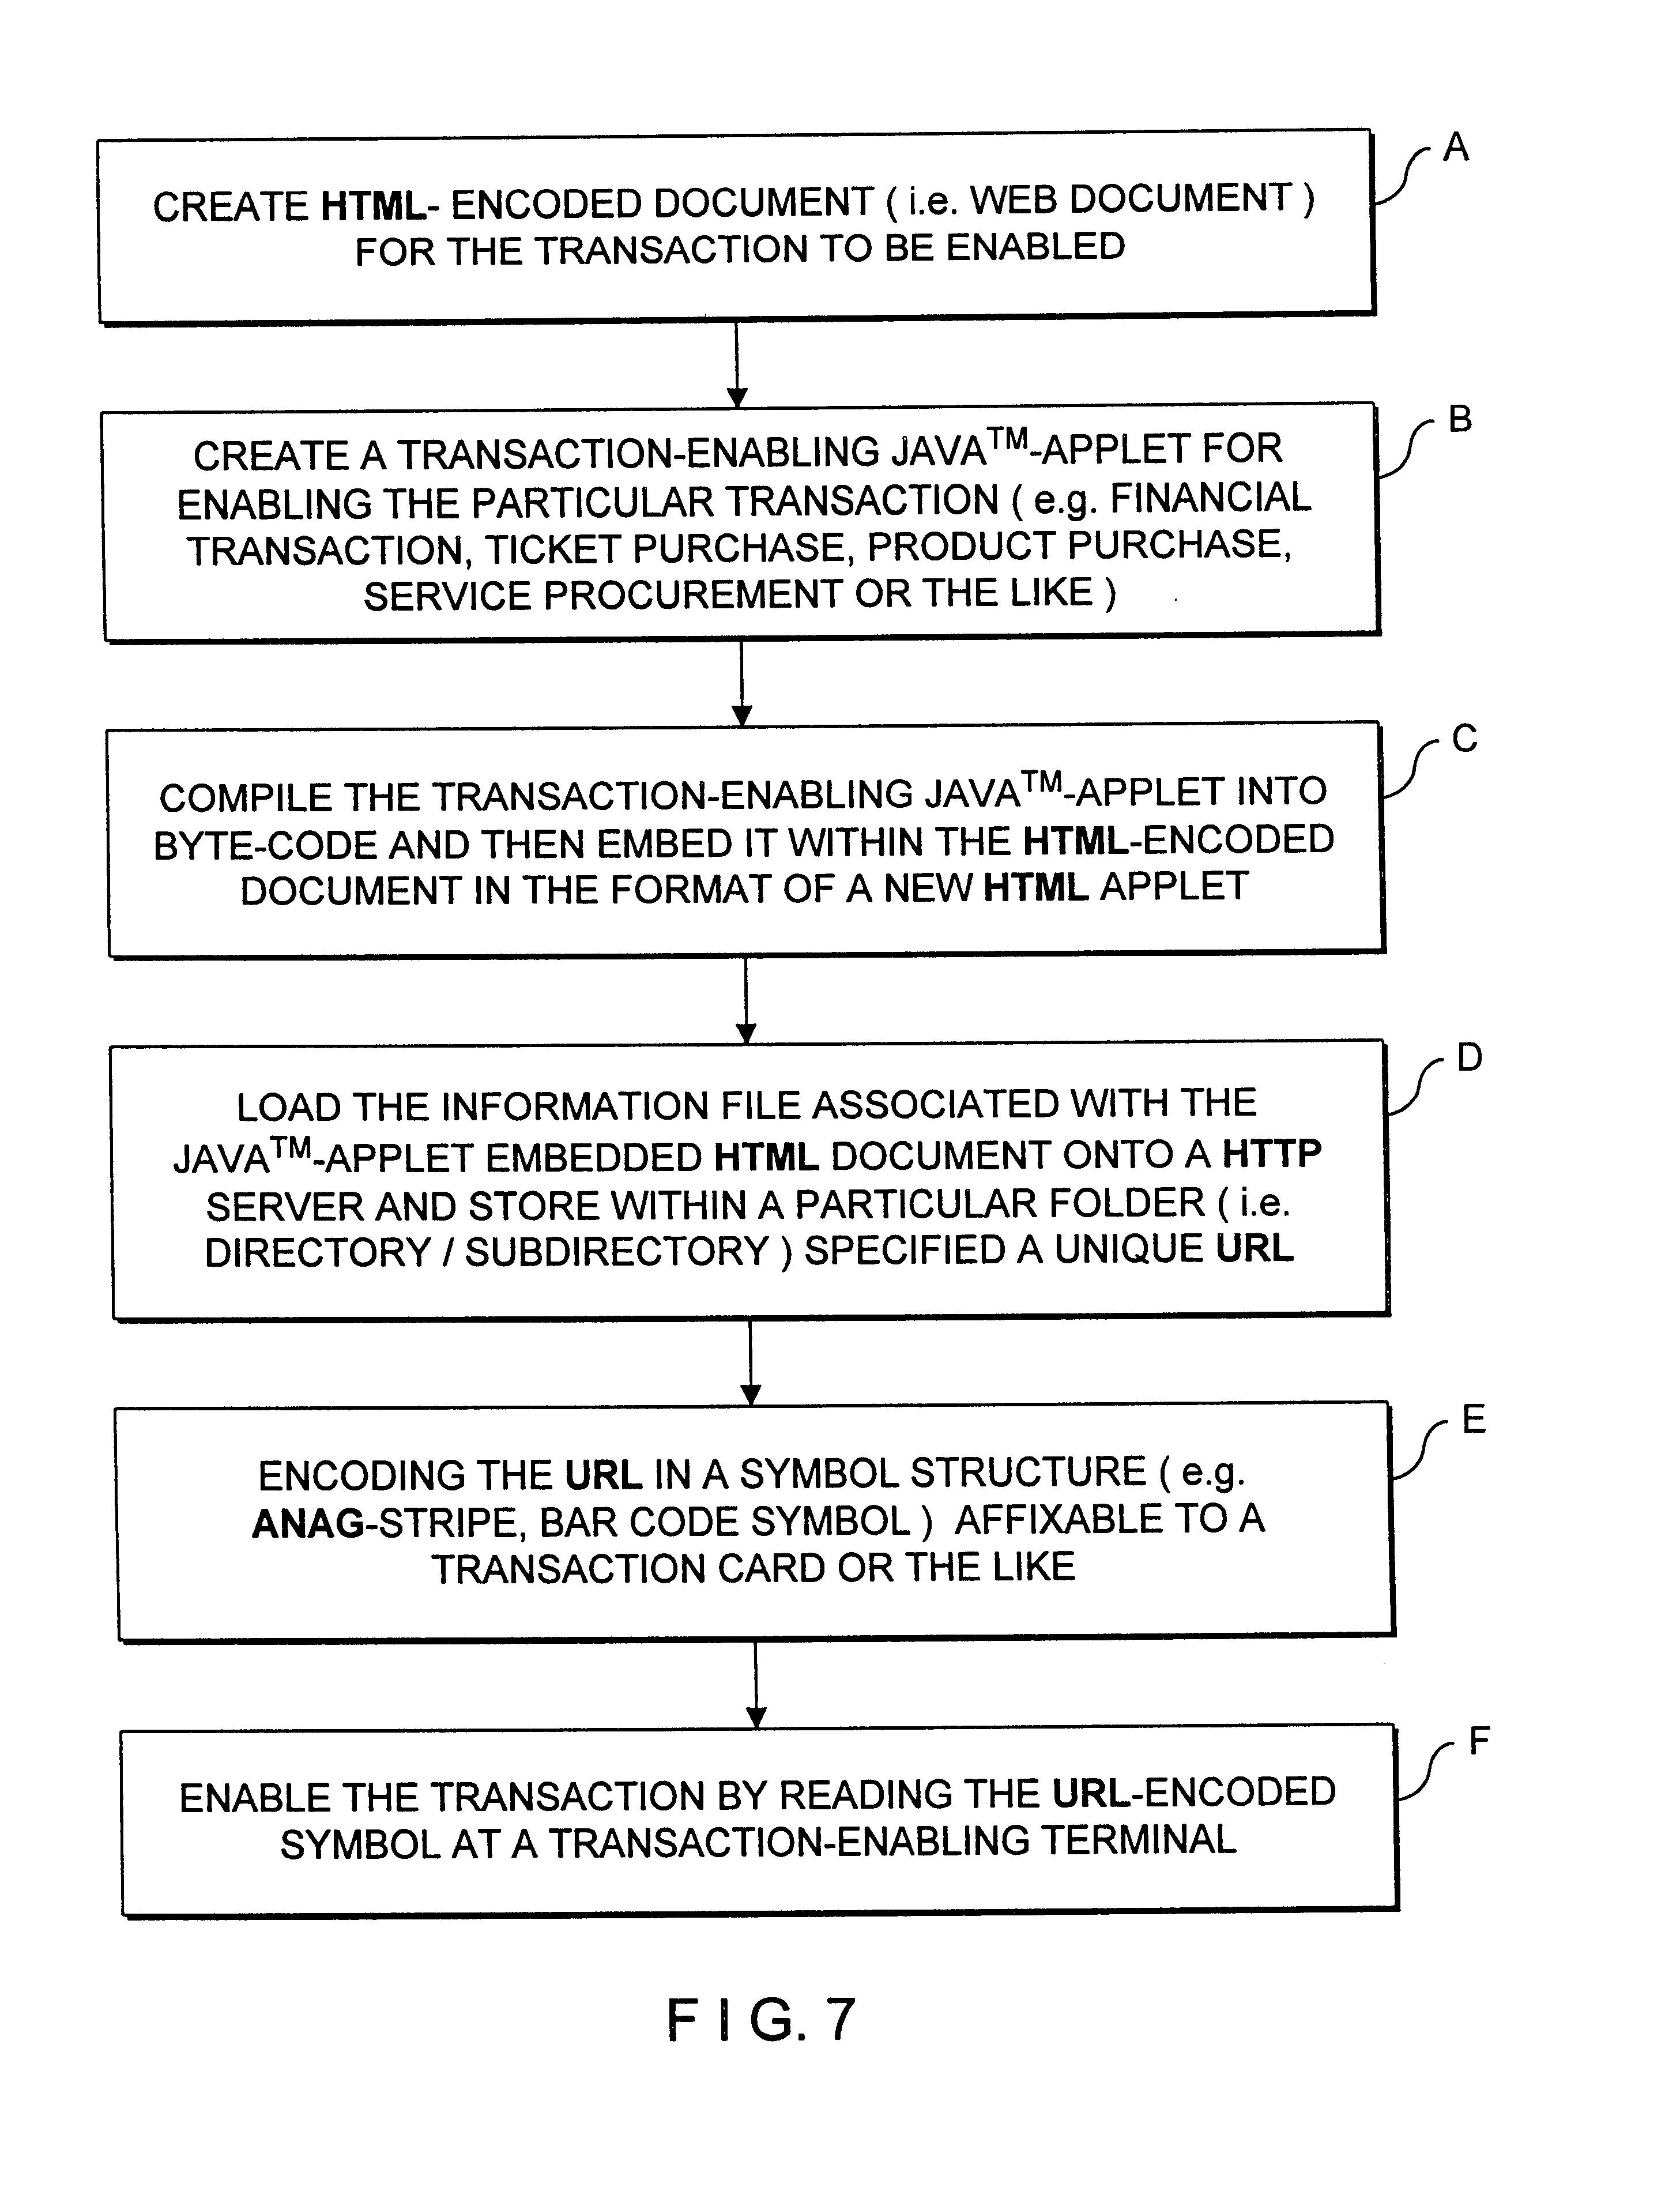 Patent US 6,412,699 B1